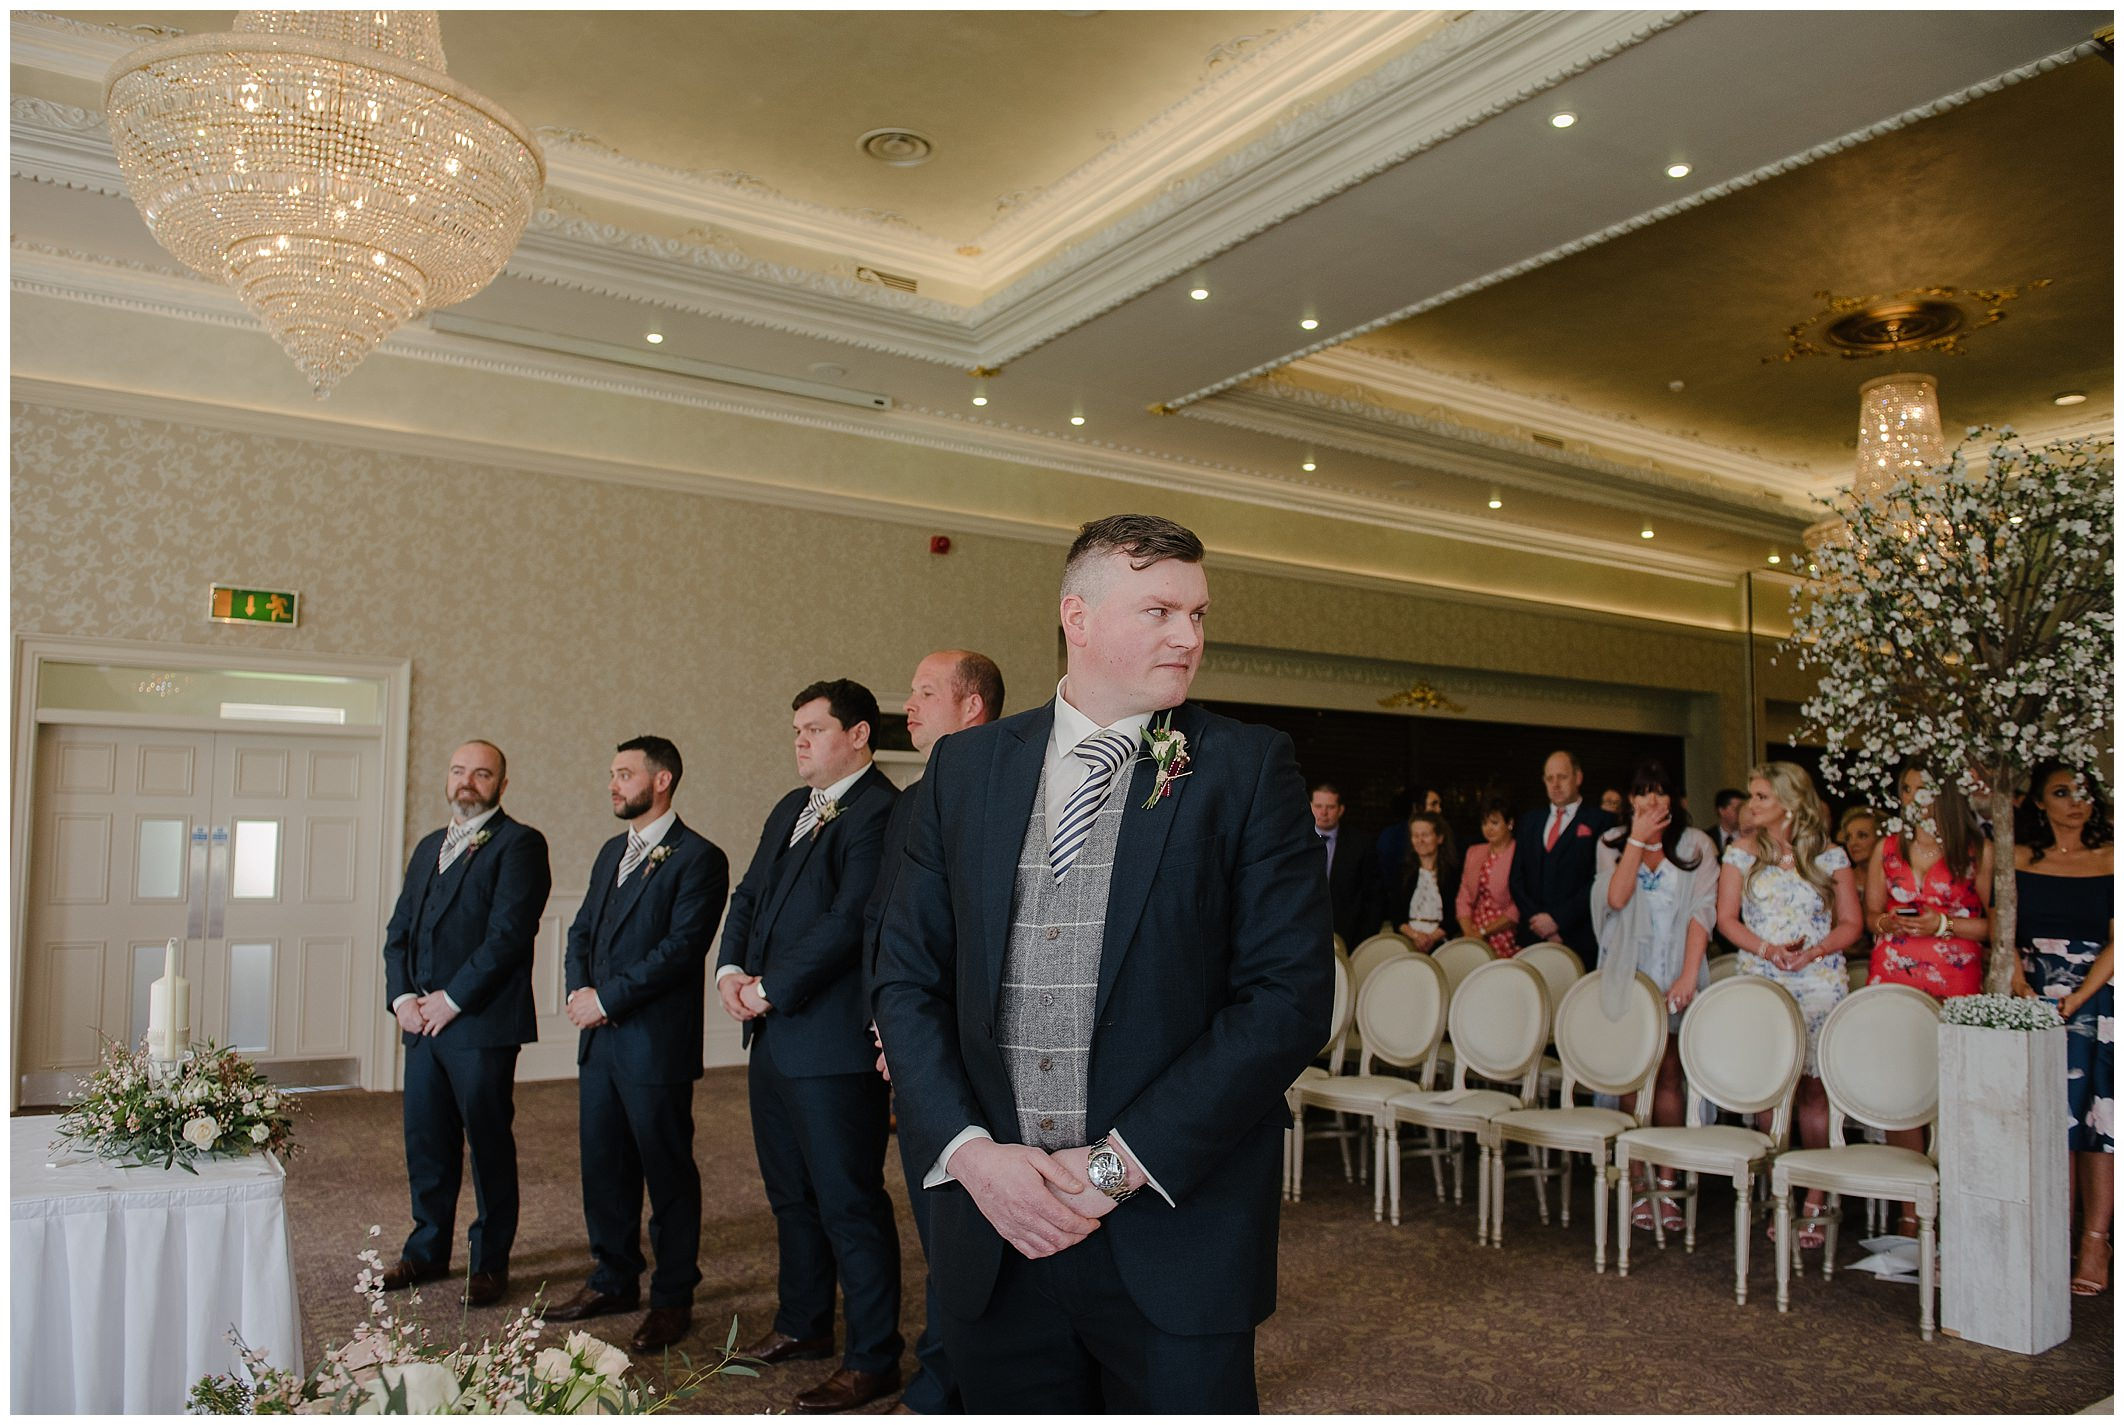 corick-house-wedding-hannah-gary-jude-browne-photography_0030.jpg